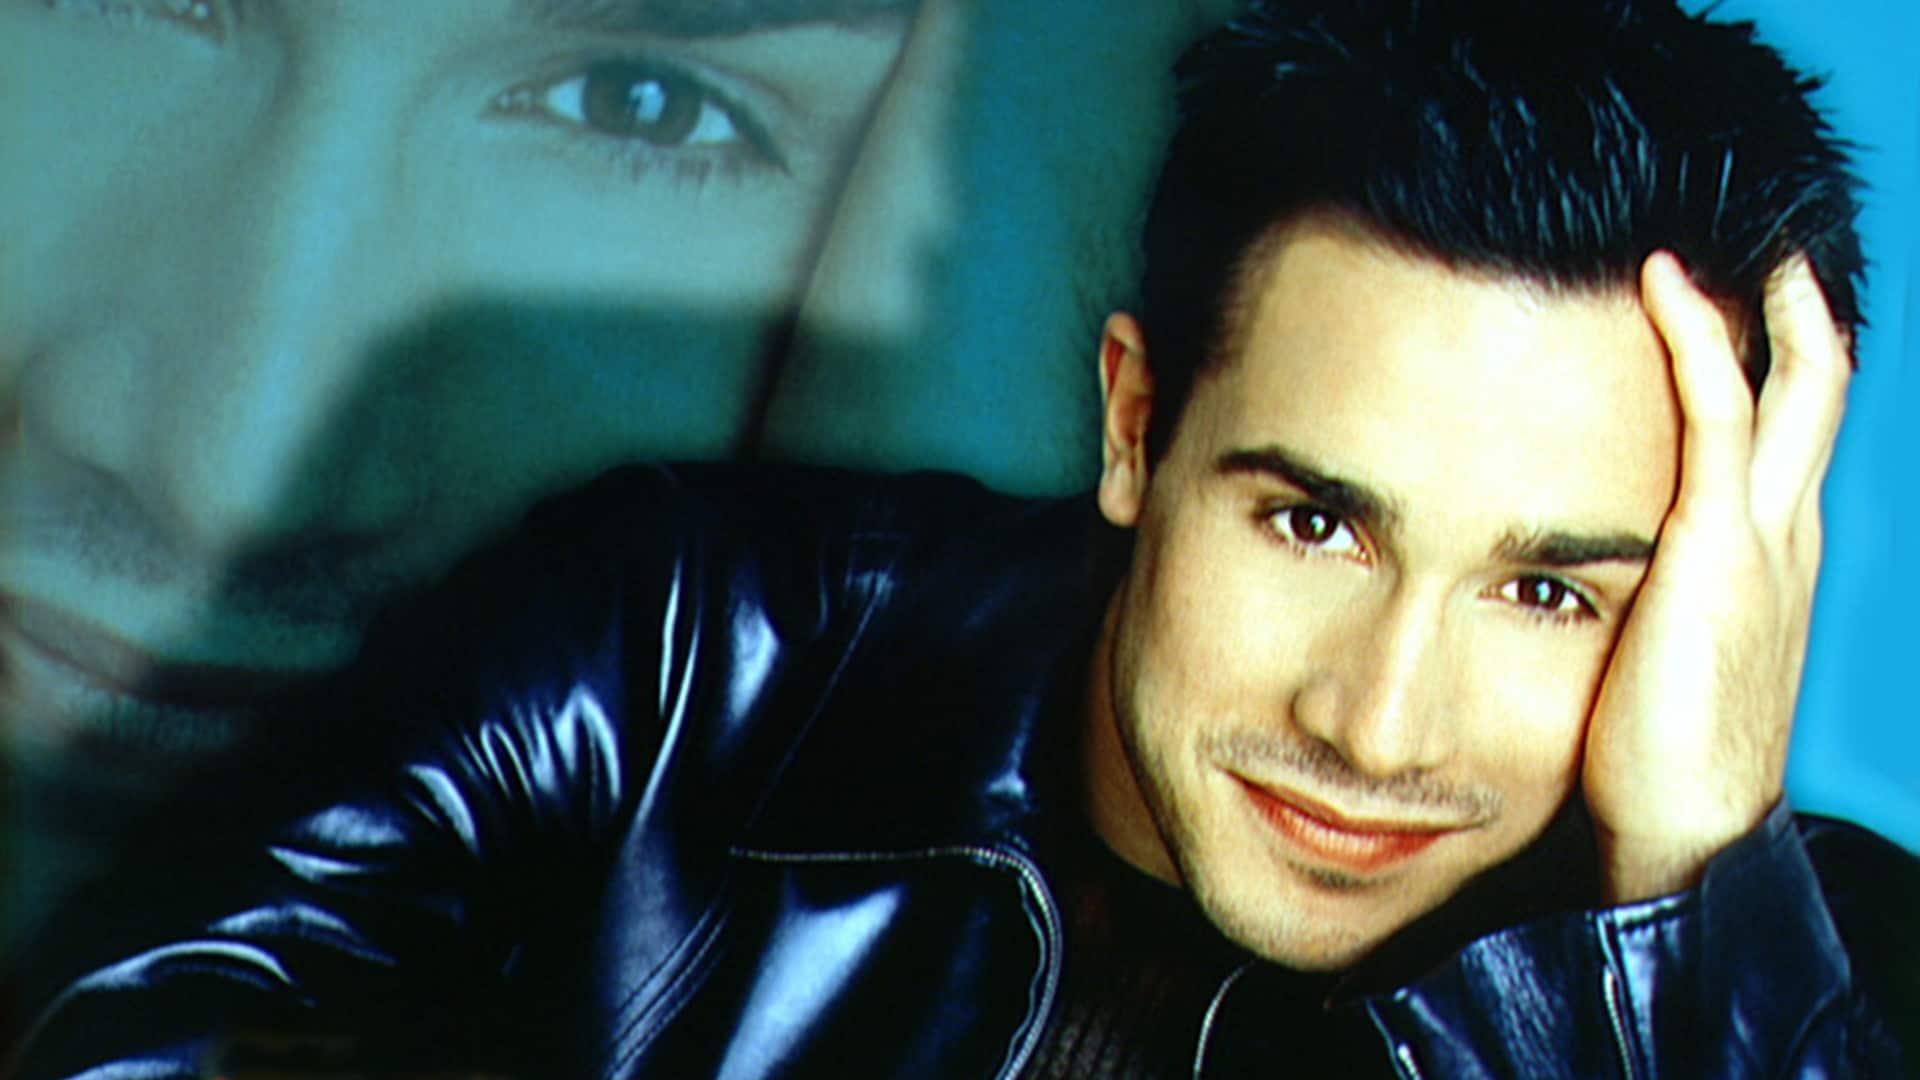 Freddie Prinze Jr.: January 15, 2000